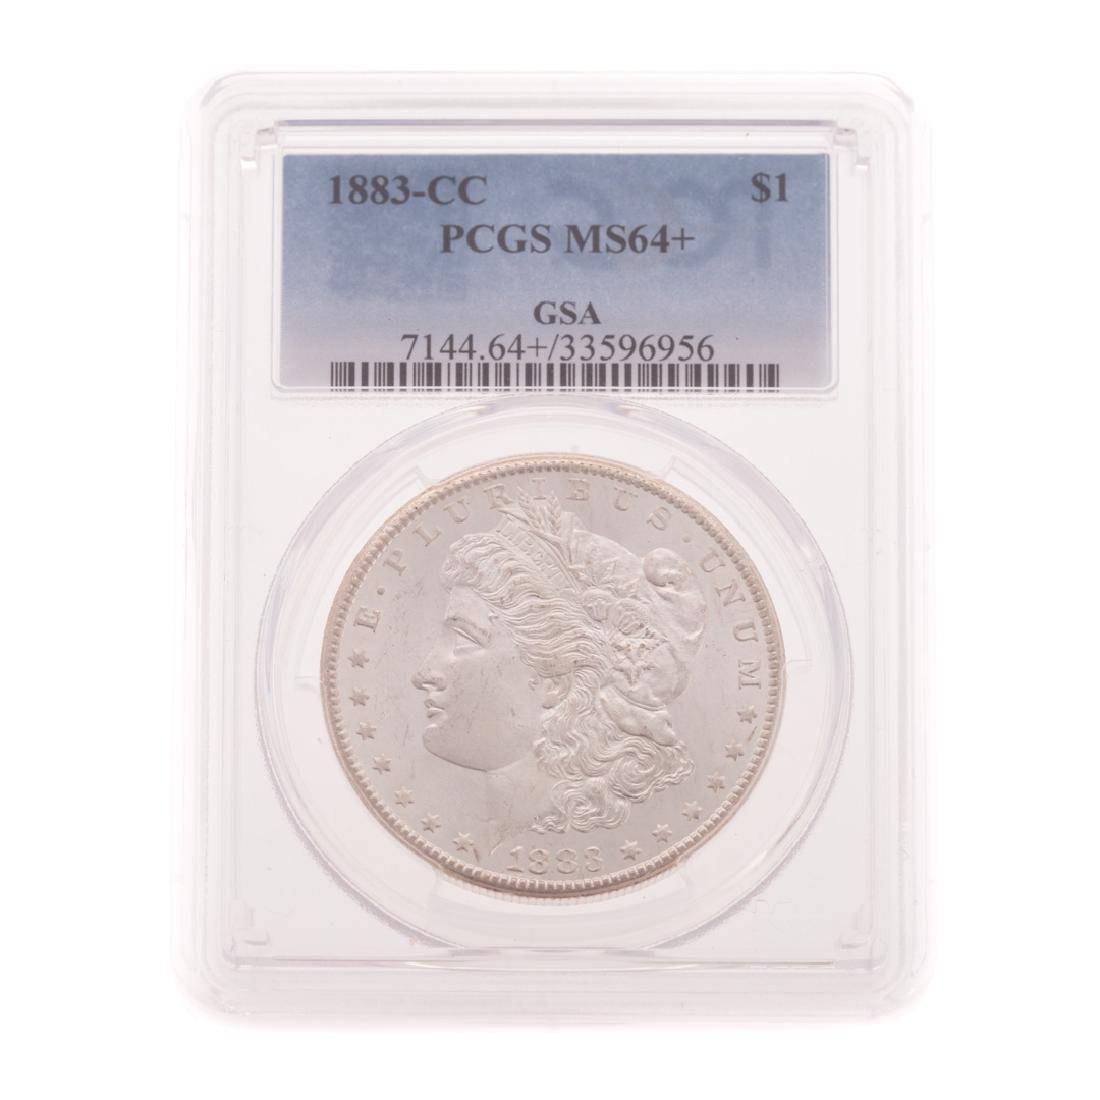 "[US] 1883-CC PCGS MS64+ Morgan Dollar ""GSA"""